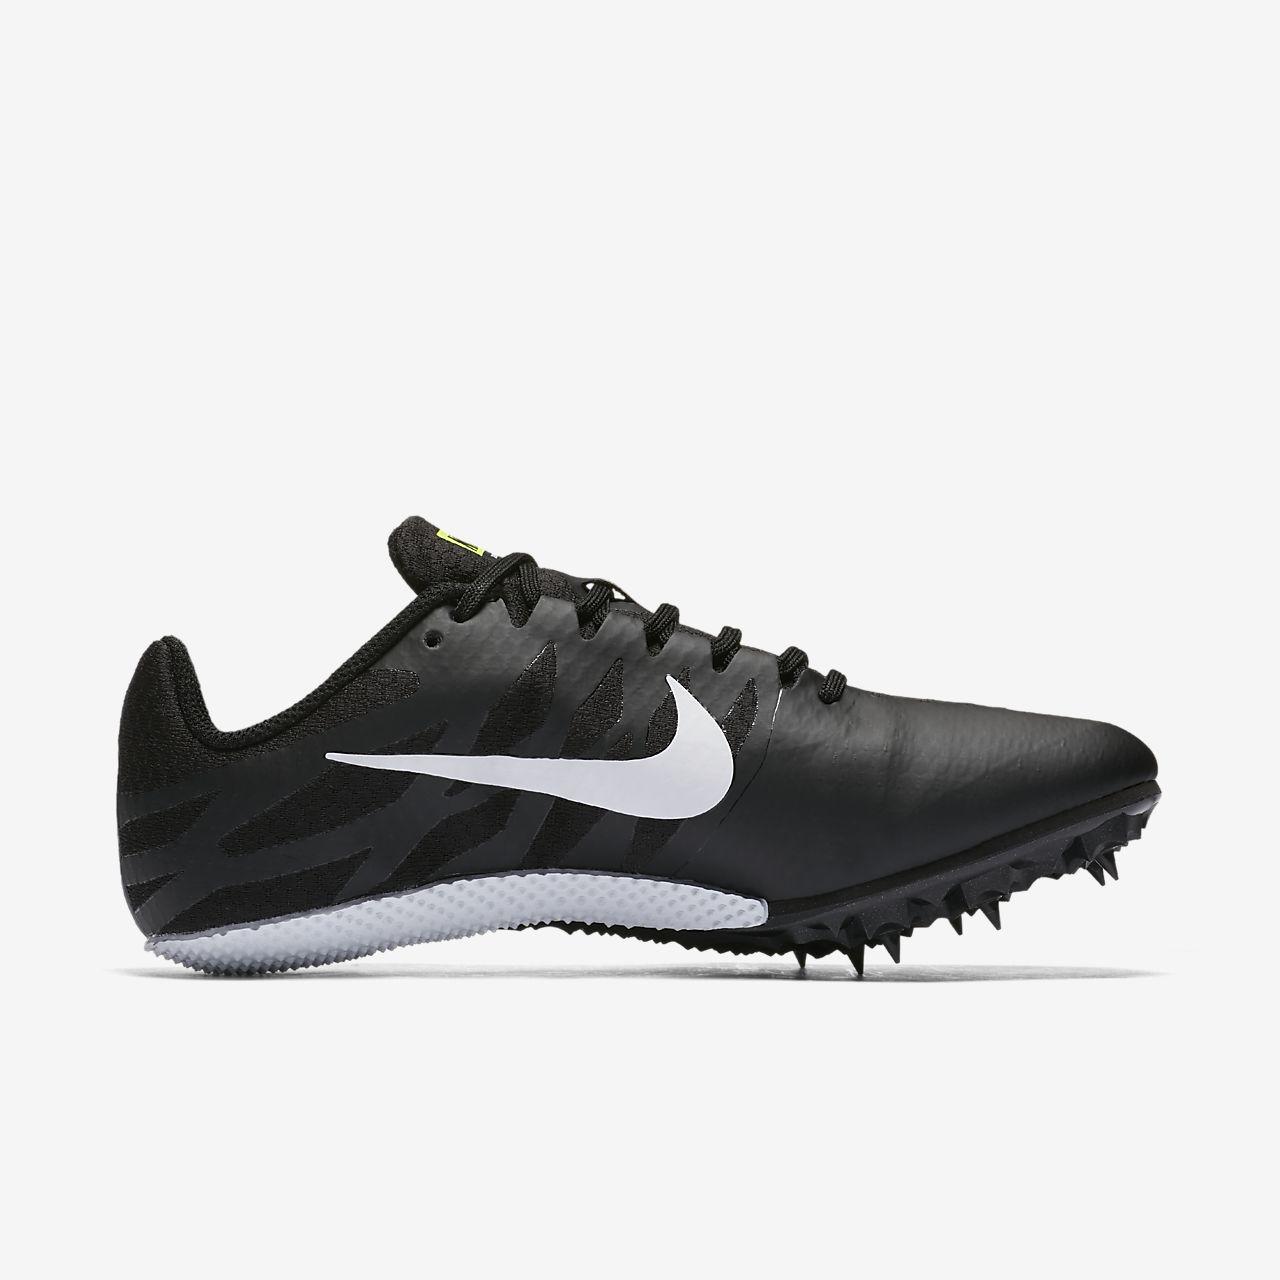 Nike Zoom Rival S 7 Plus